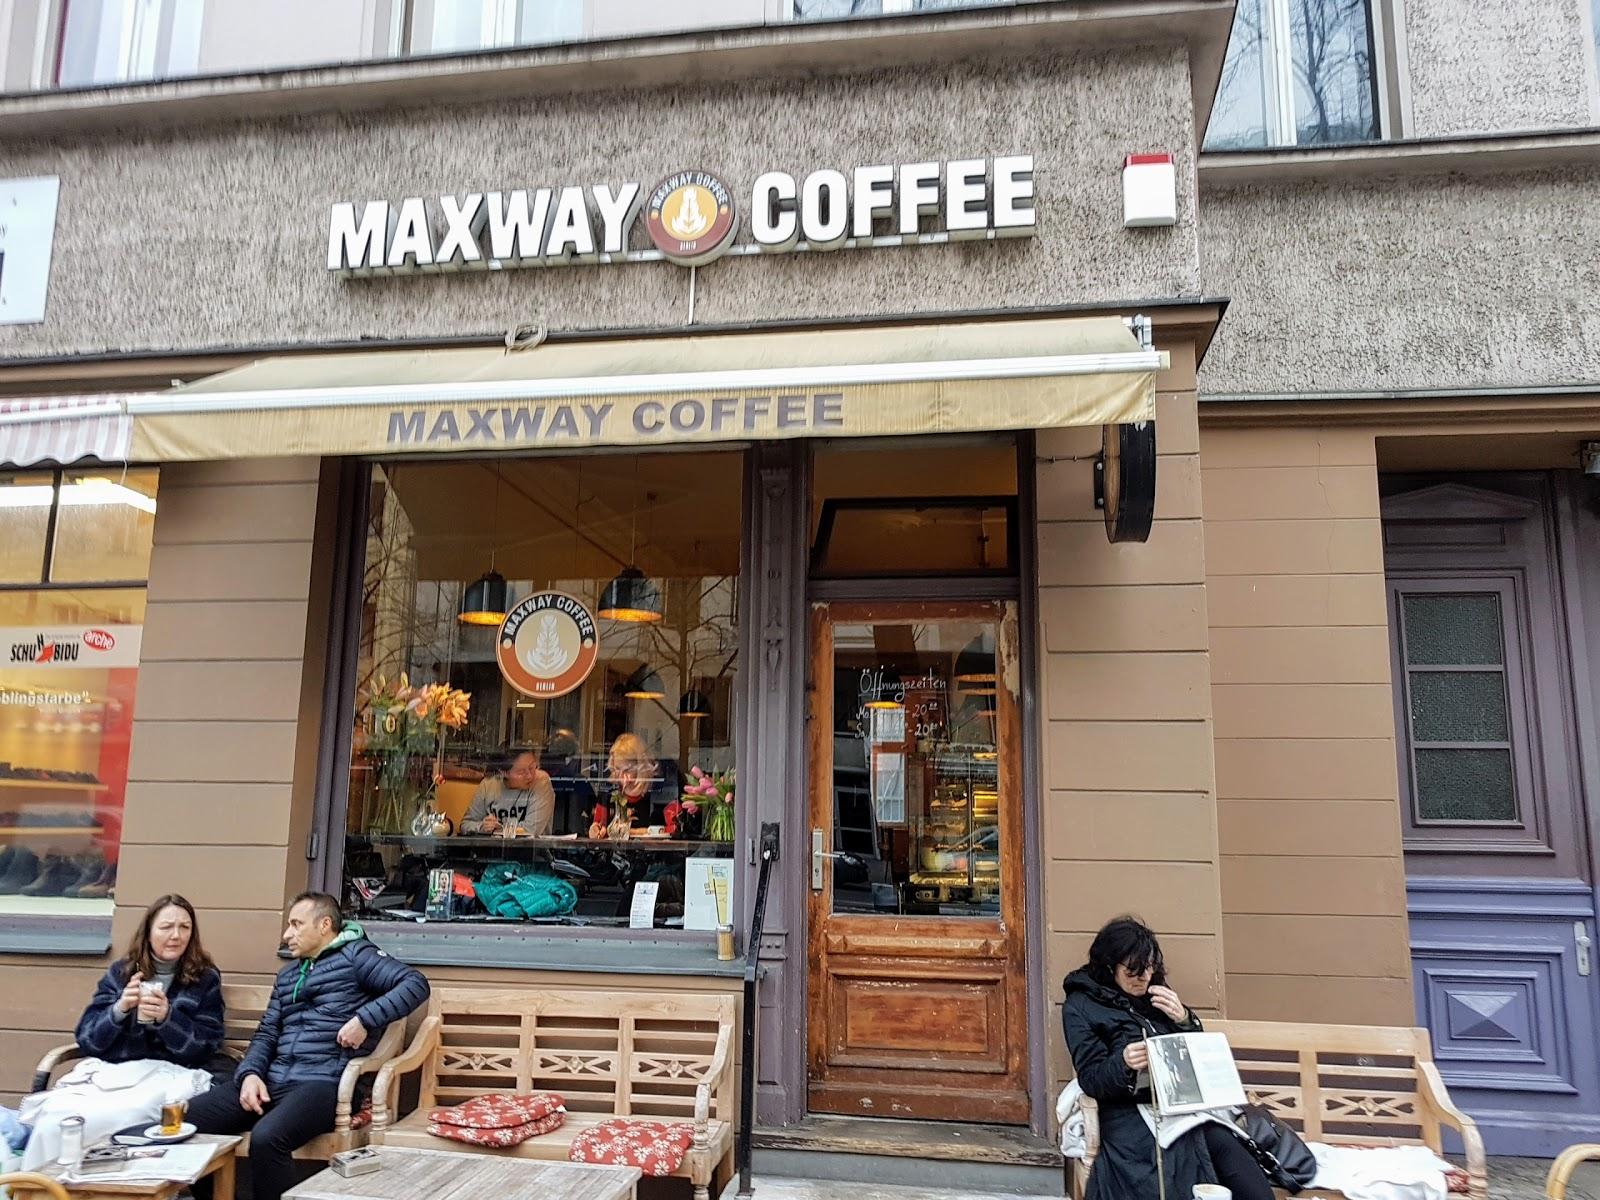 Maxway Coffee: A Work-Friendly Place in Berlin